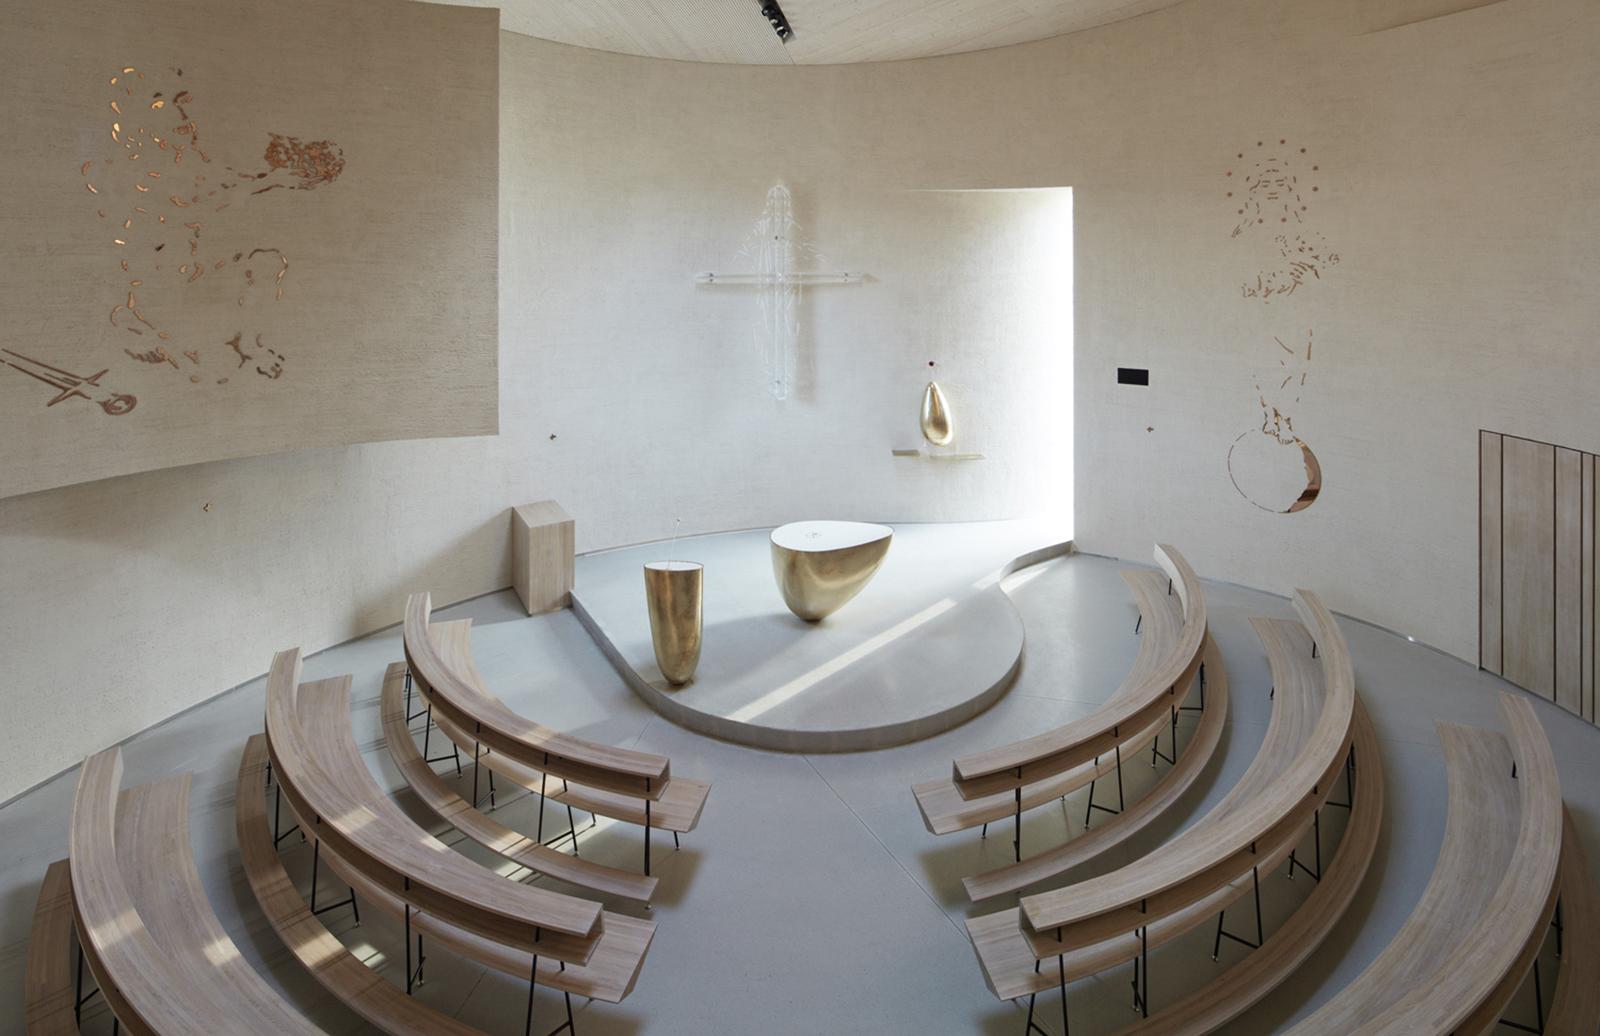 Church of St Wenceslas by Atelier Stepan, Sazovice, Czech Republic